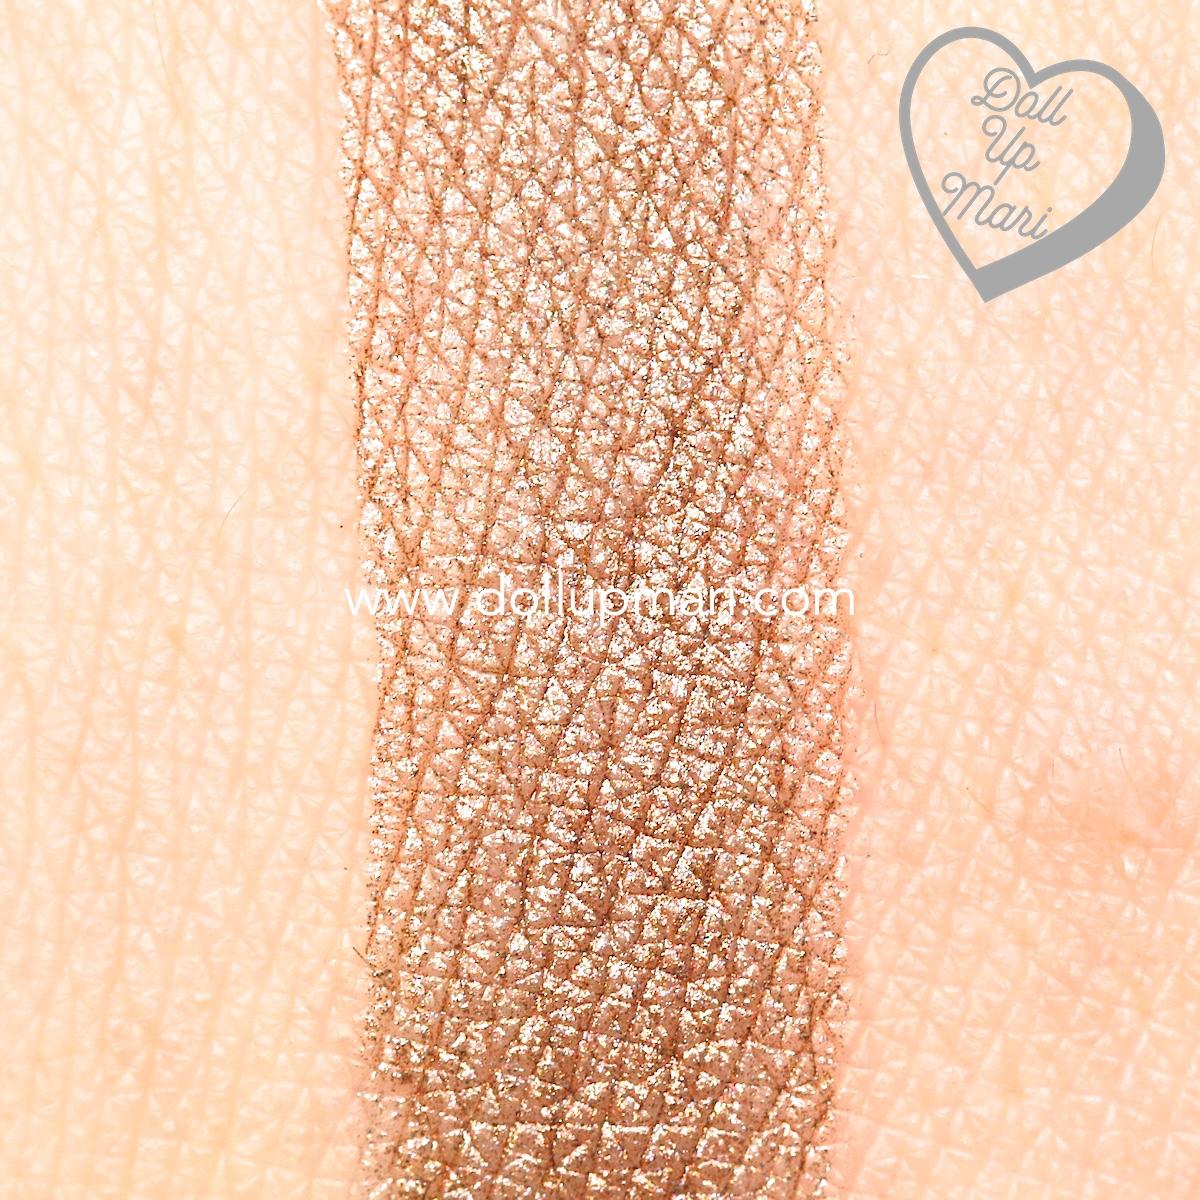 Maybelline Sensational Effects Liquid Eyeshadow S04 Smoky Bronze Swatch